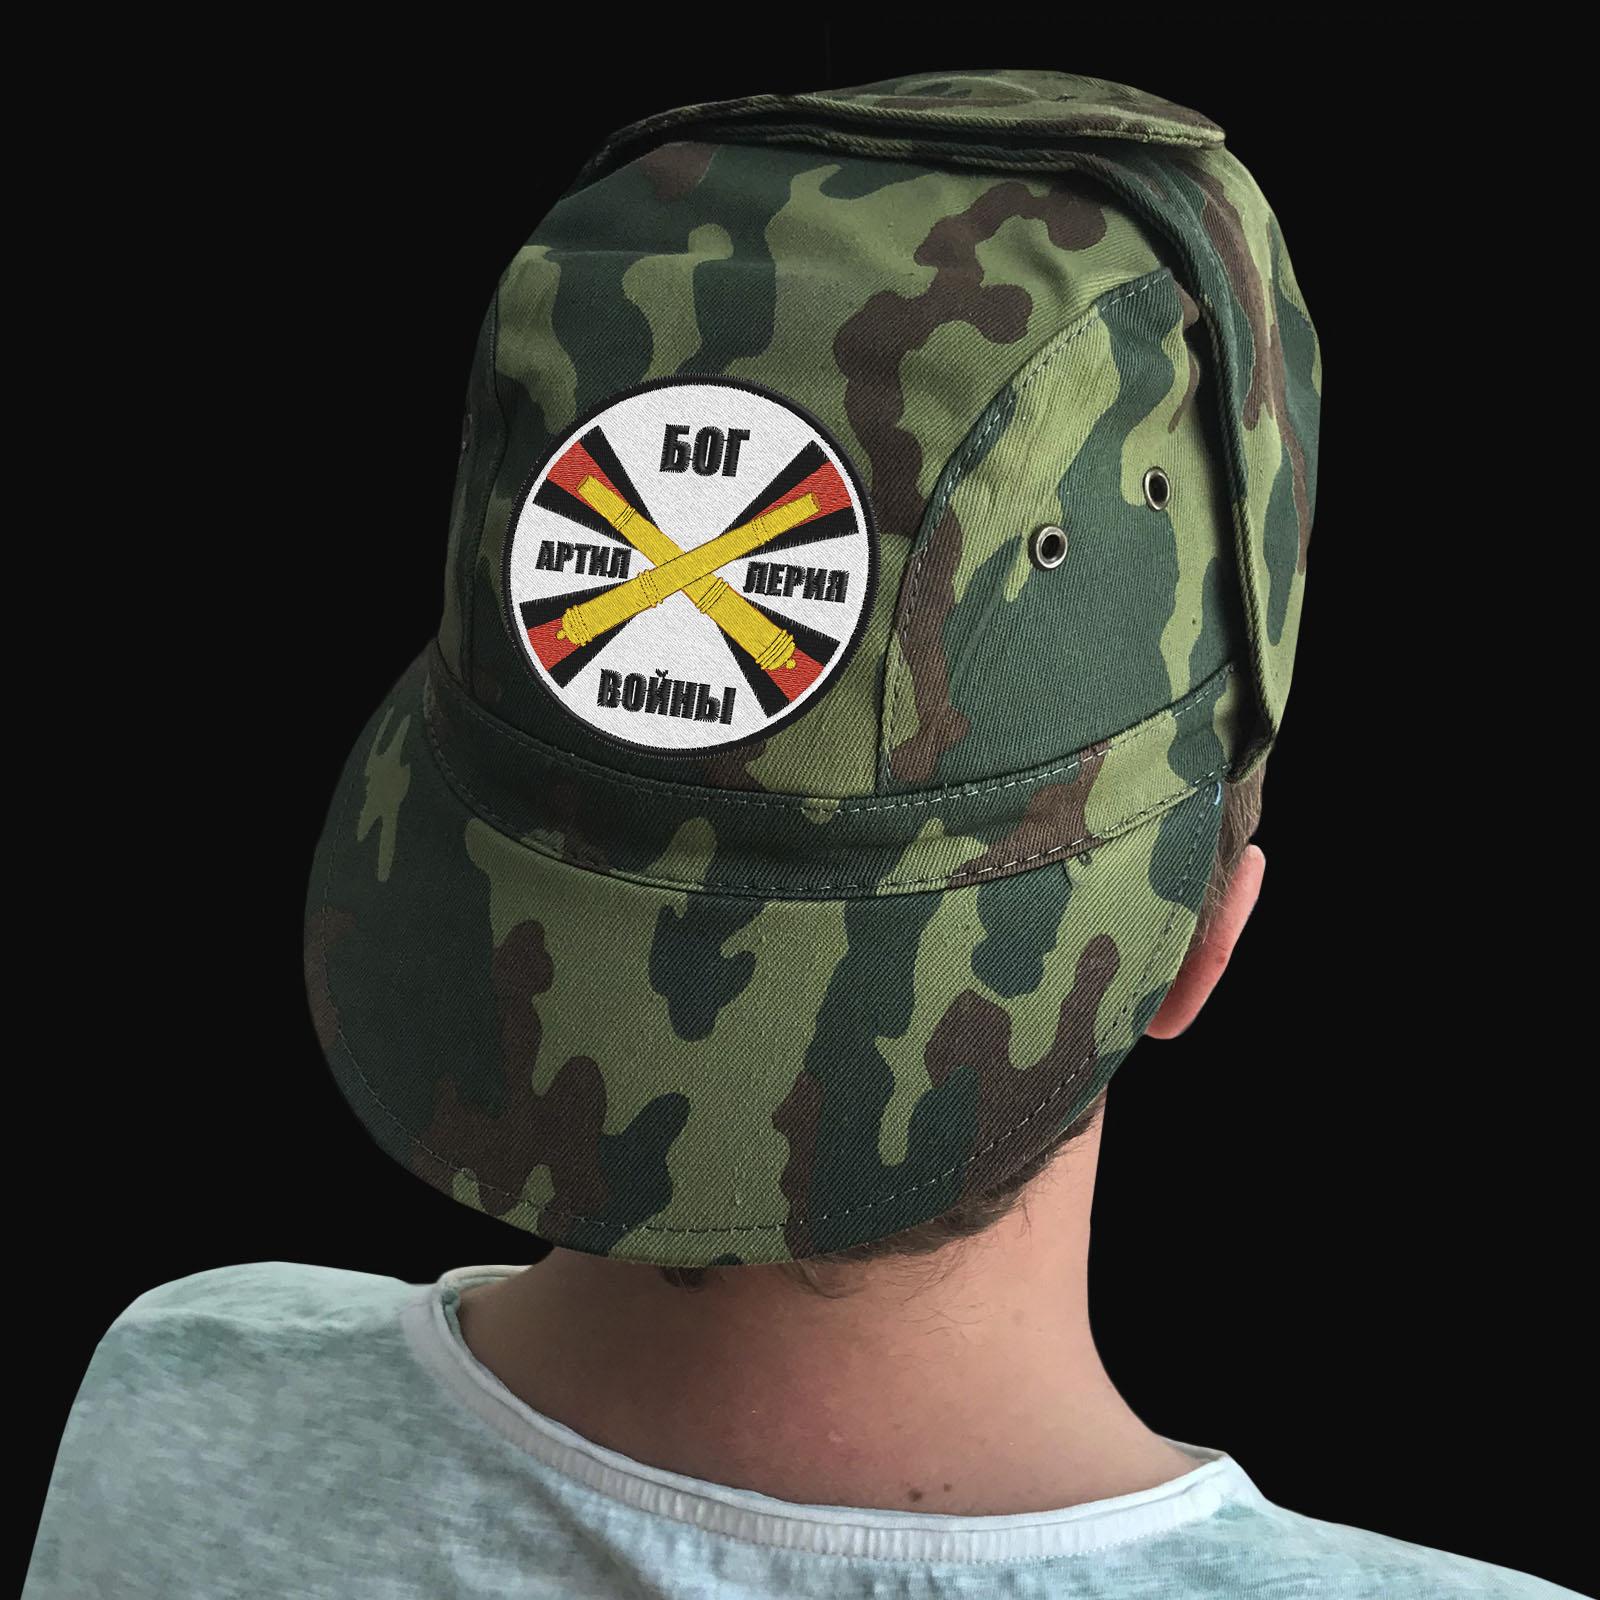 Армейские кепки в артиллерийском дизайне